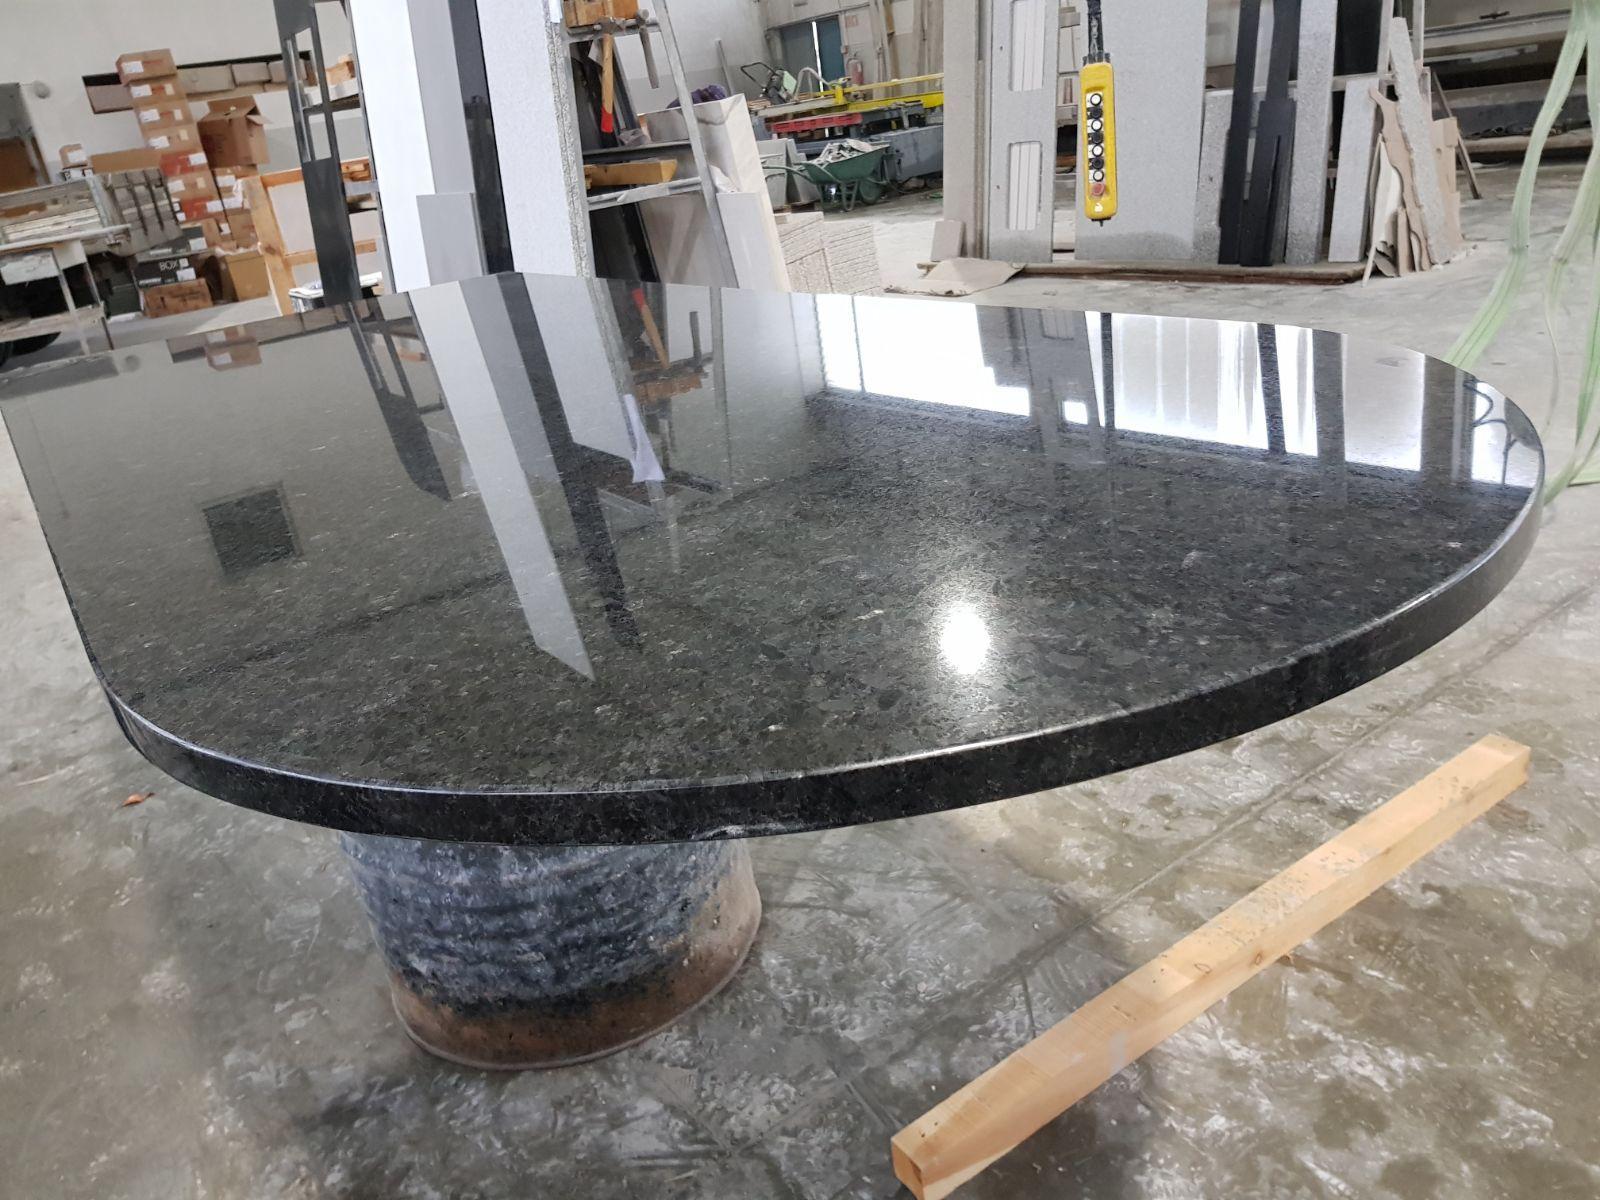 Plan Travail Granit Portugal eco stone (ecostone) sur pinterest